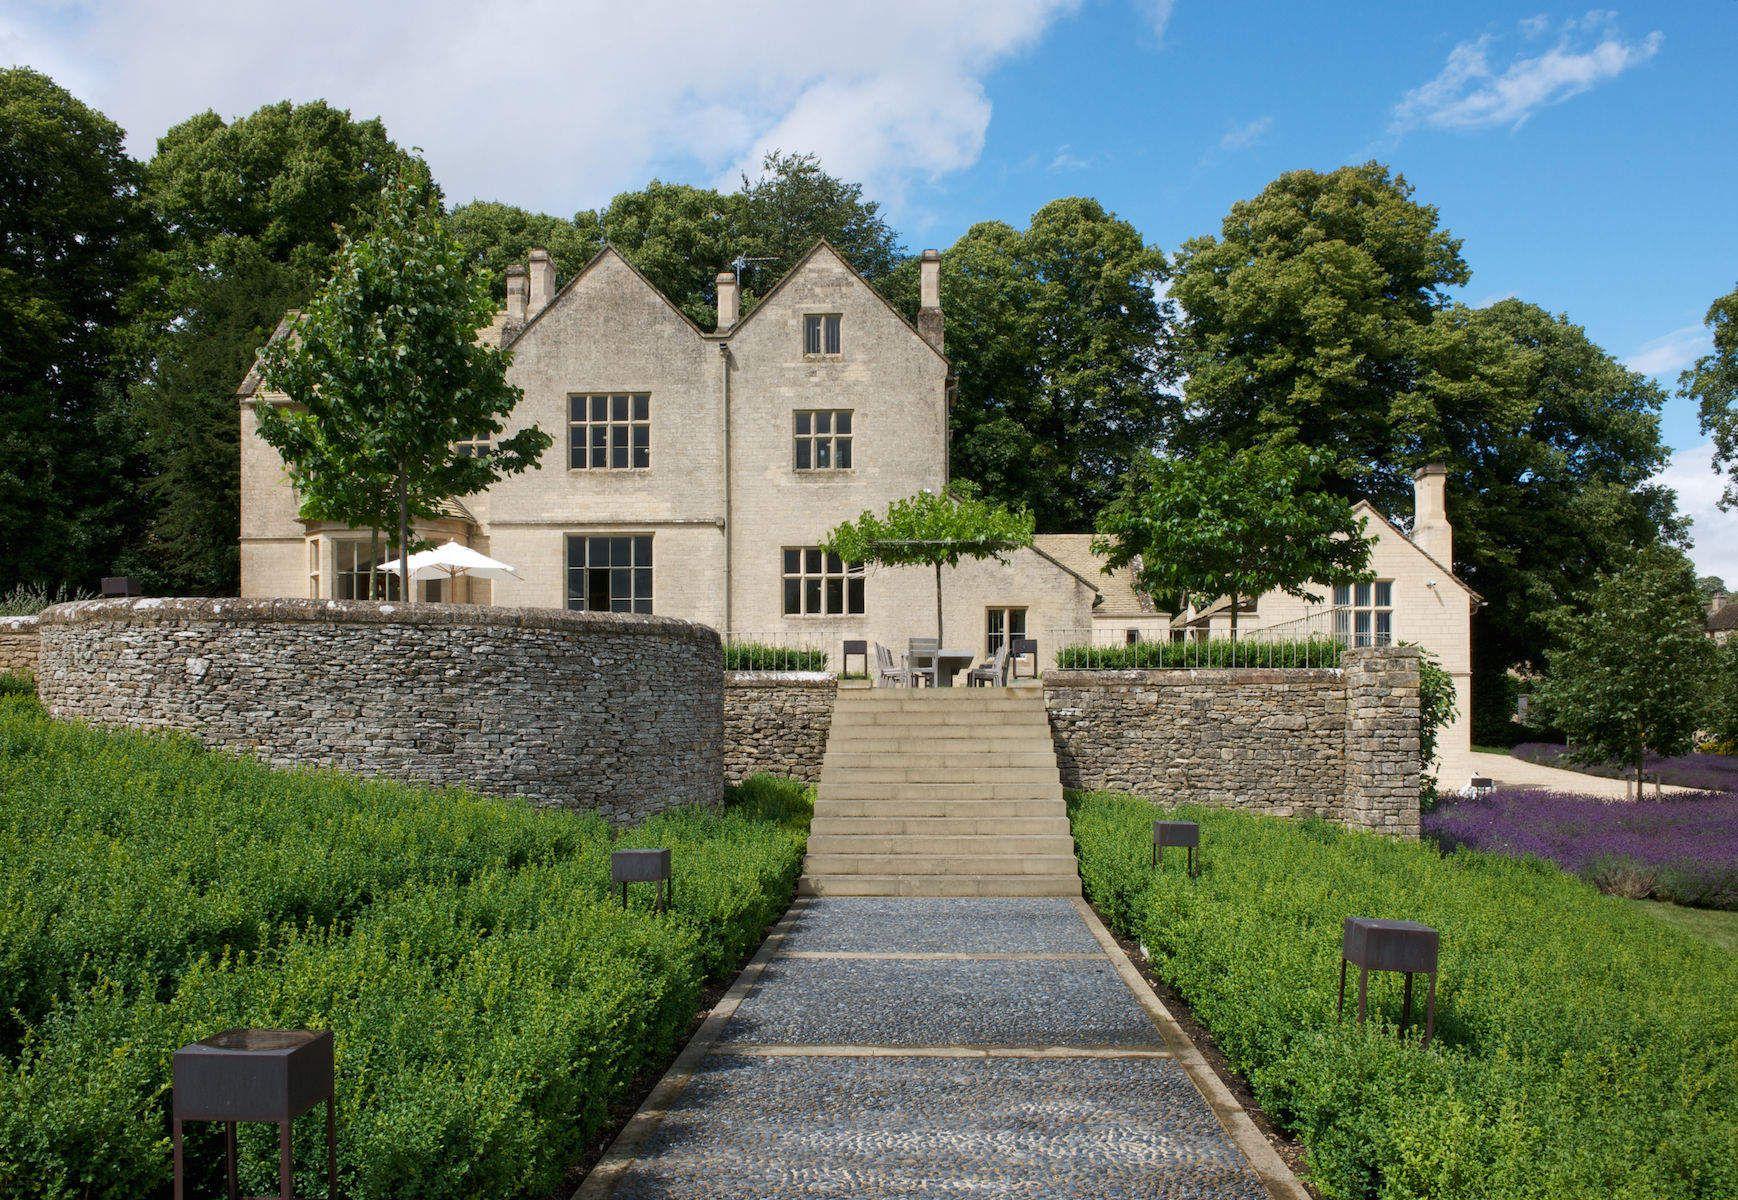 A Jeweler's Residence, UK